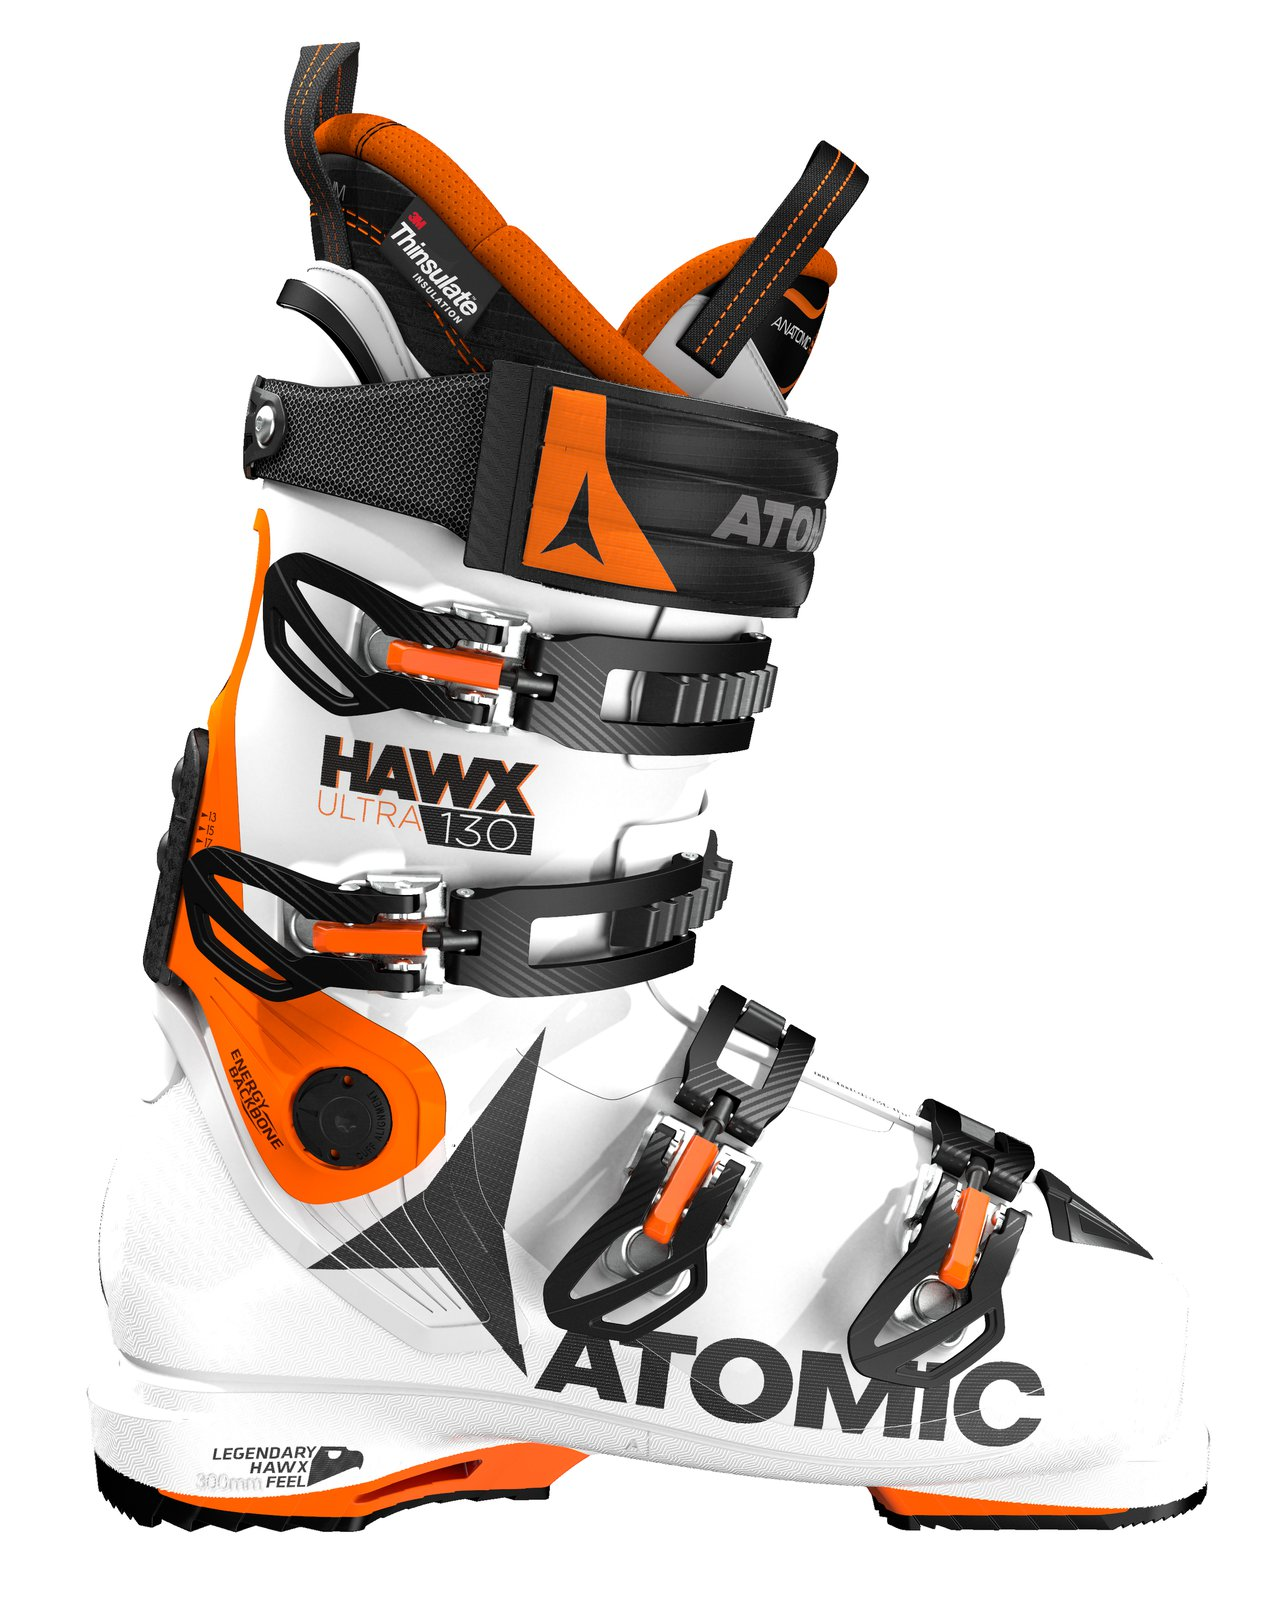 comfortable black comforter ski petrol qst orange boots salomon alpine side pro blue